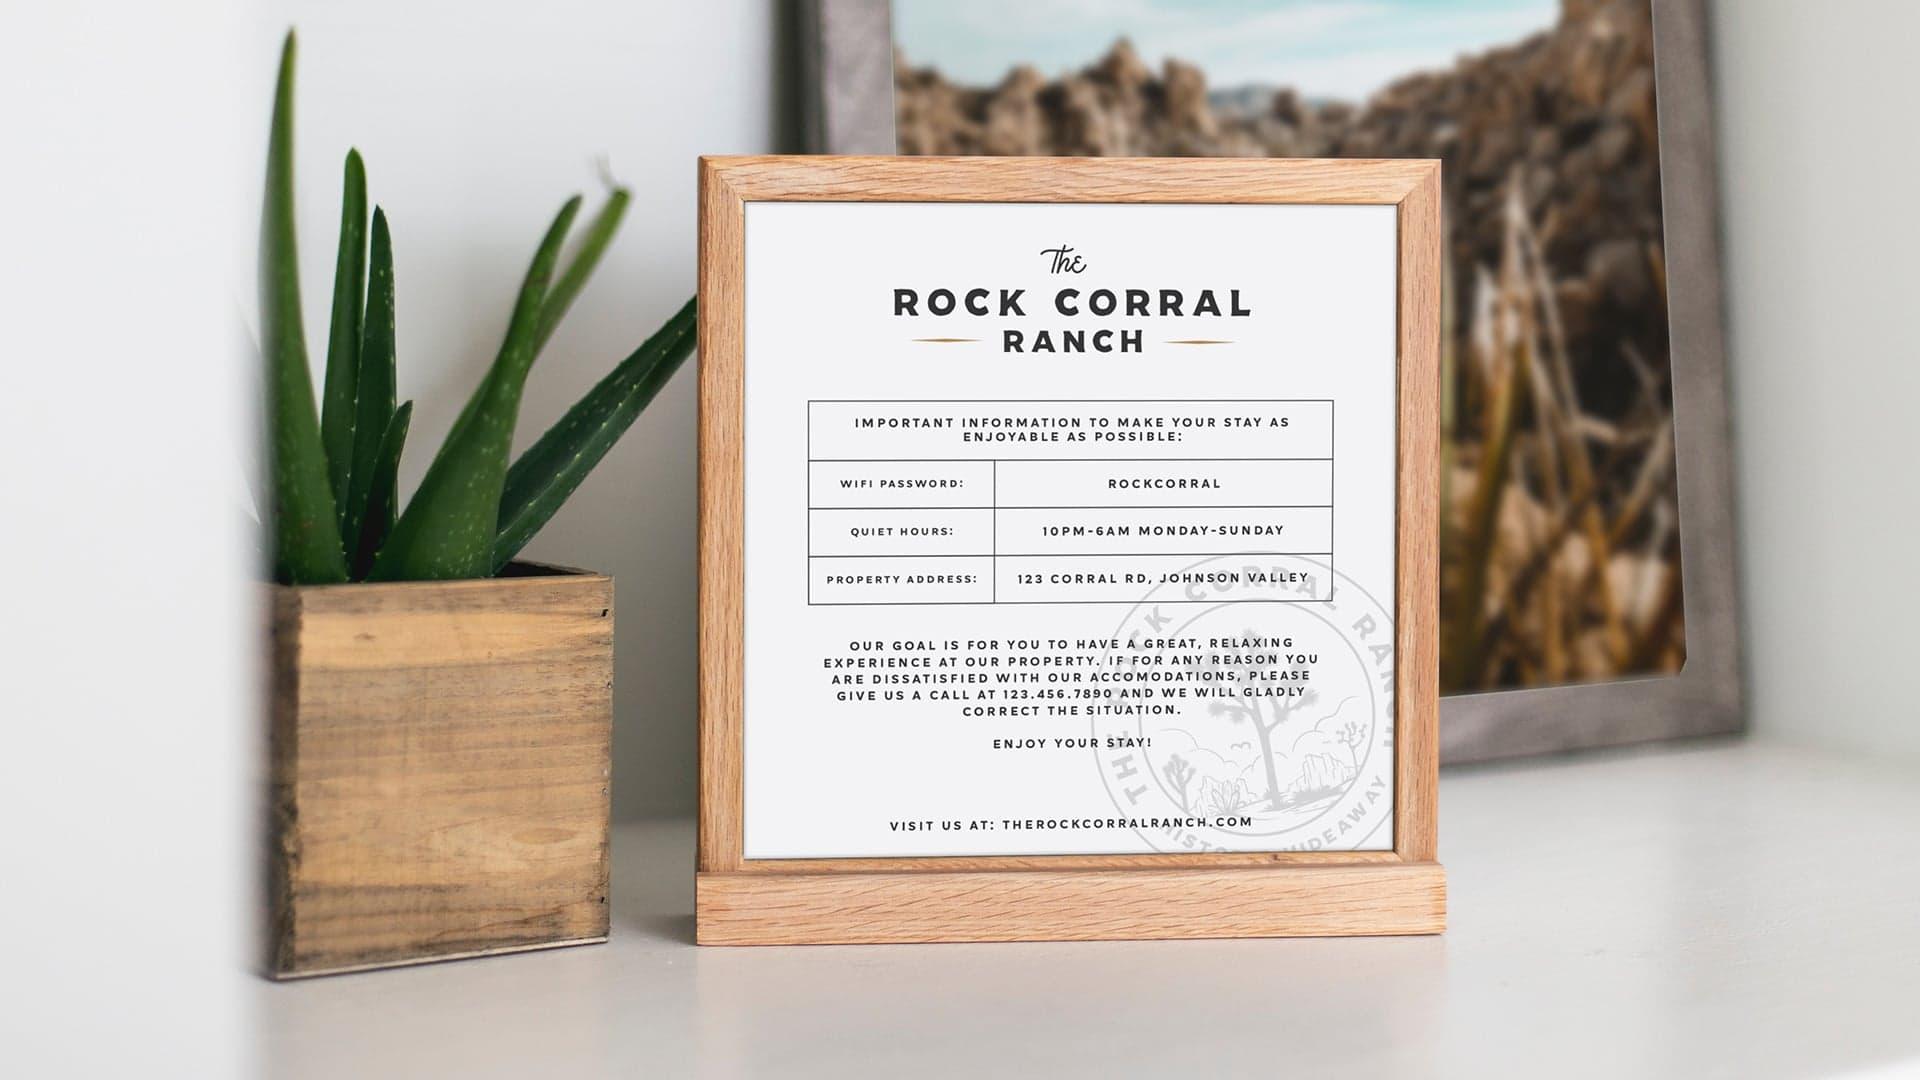 The Rock Corral Ranch Check In - Unsung Studio Branding